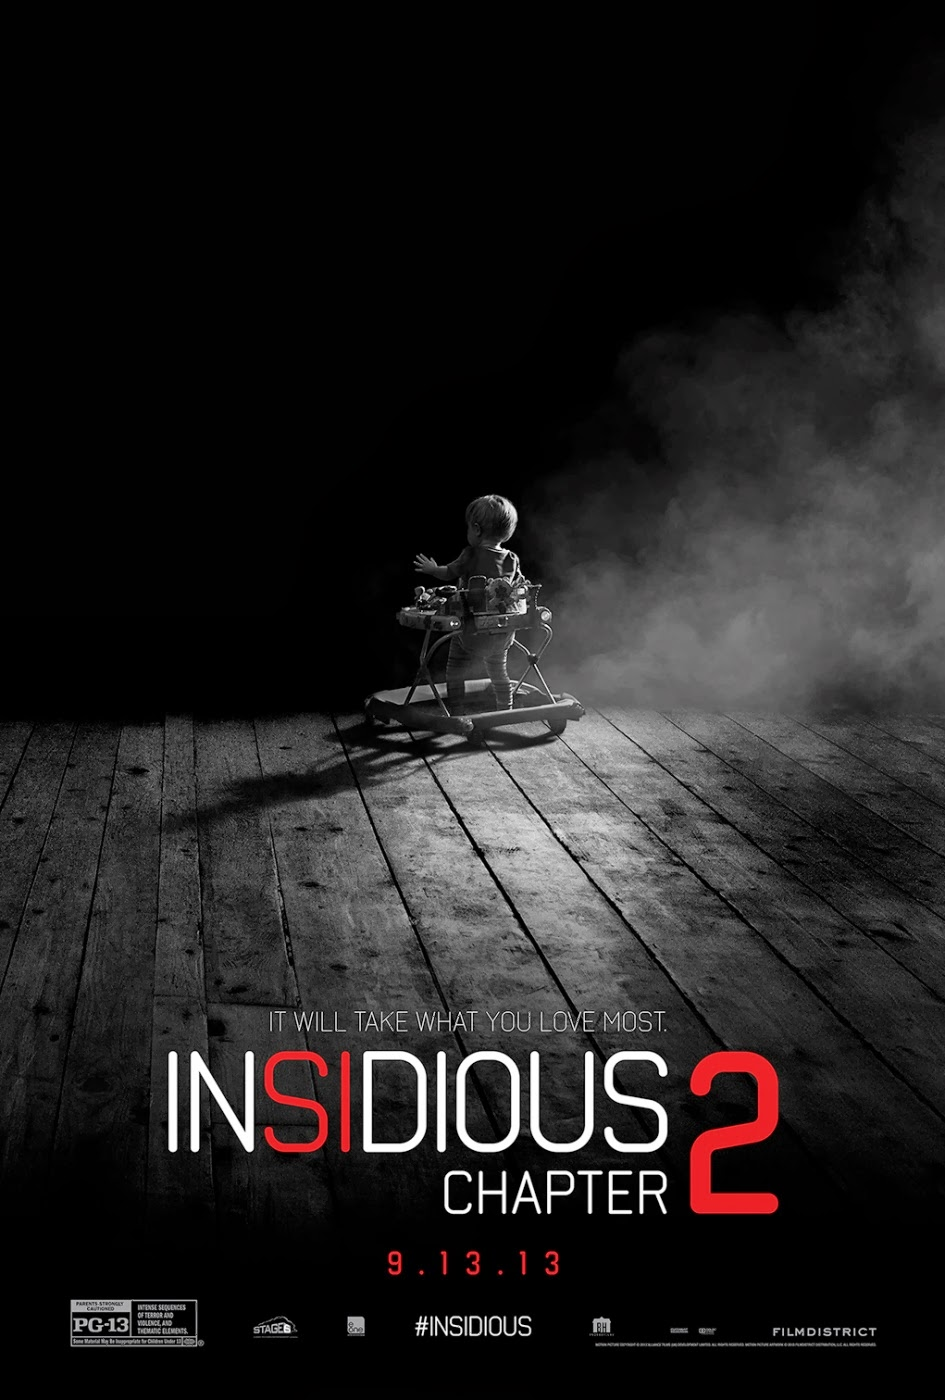 Ver La noche del demonio 2 (Insidious 2) (2013) Online